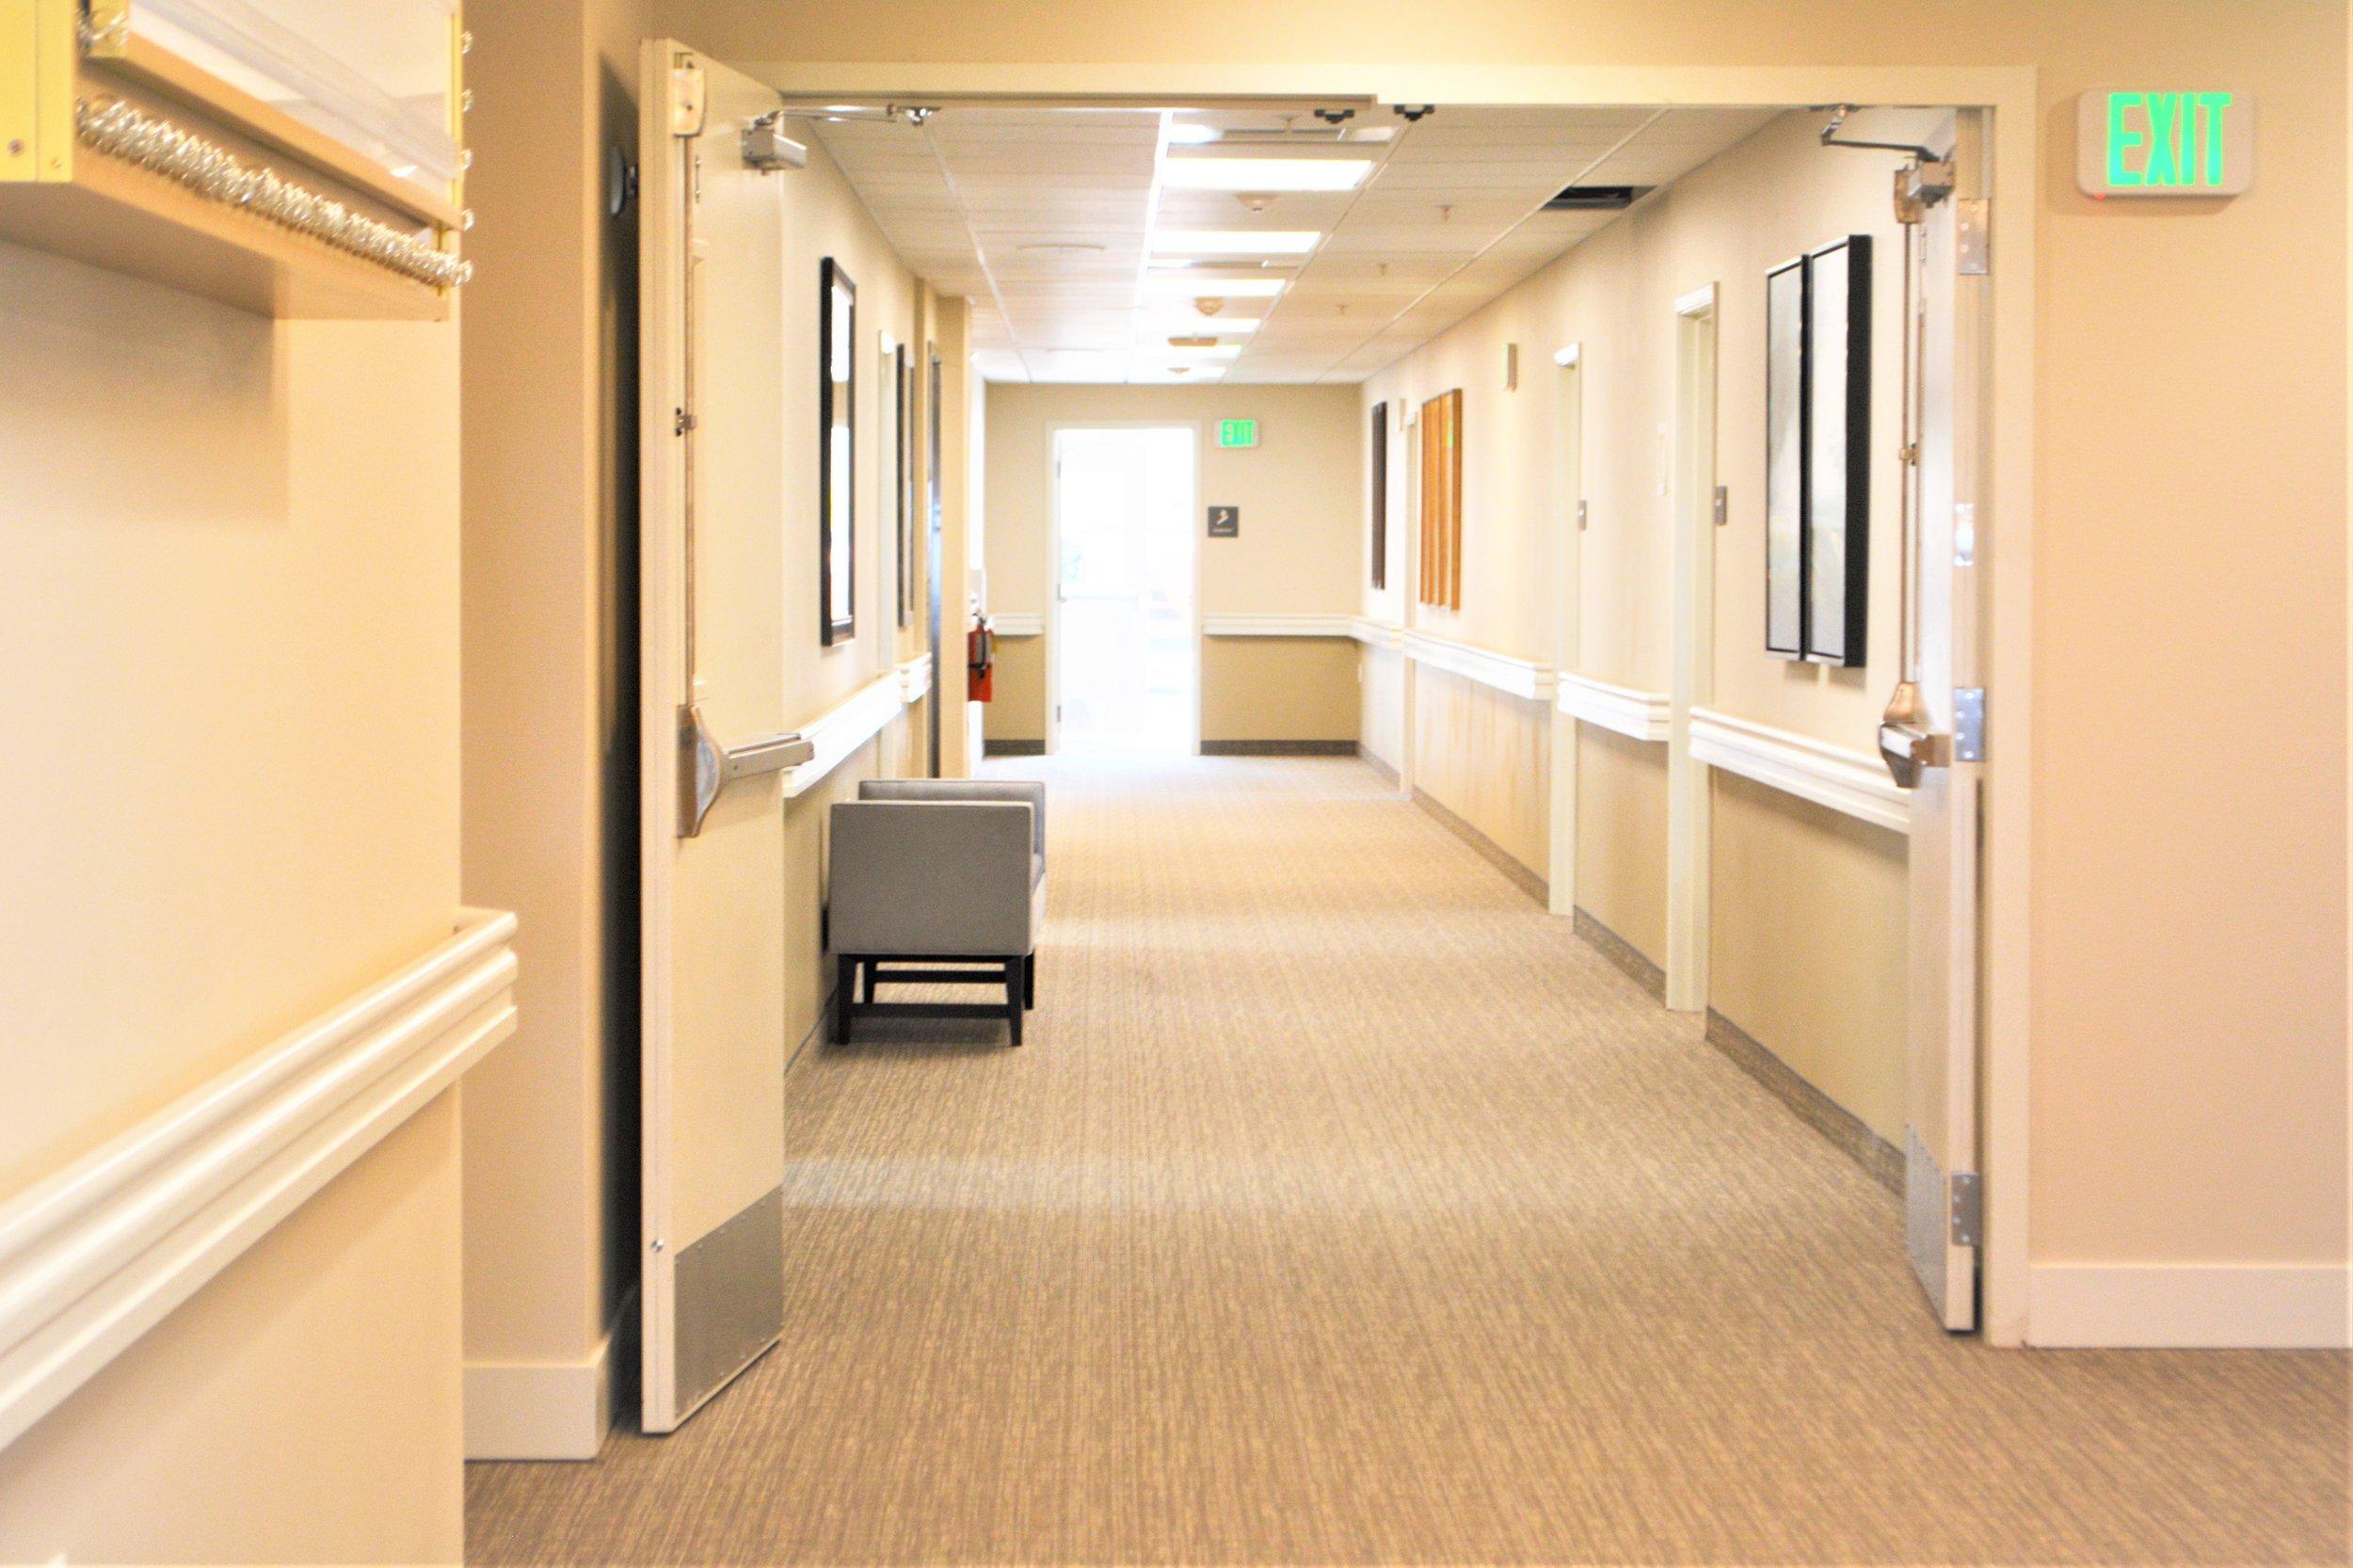 corridor finishes and doors.JPG